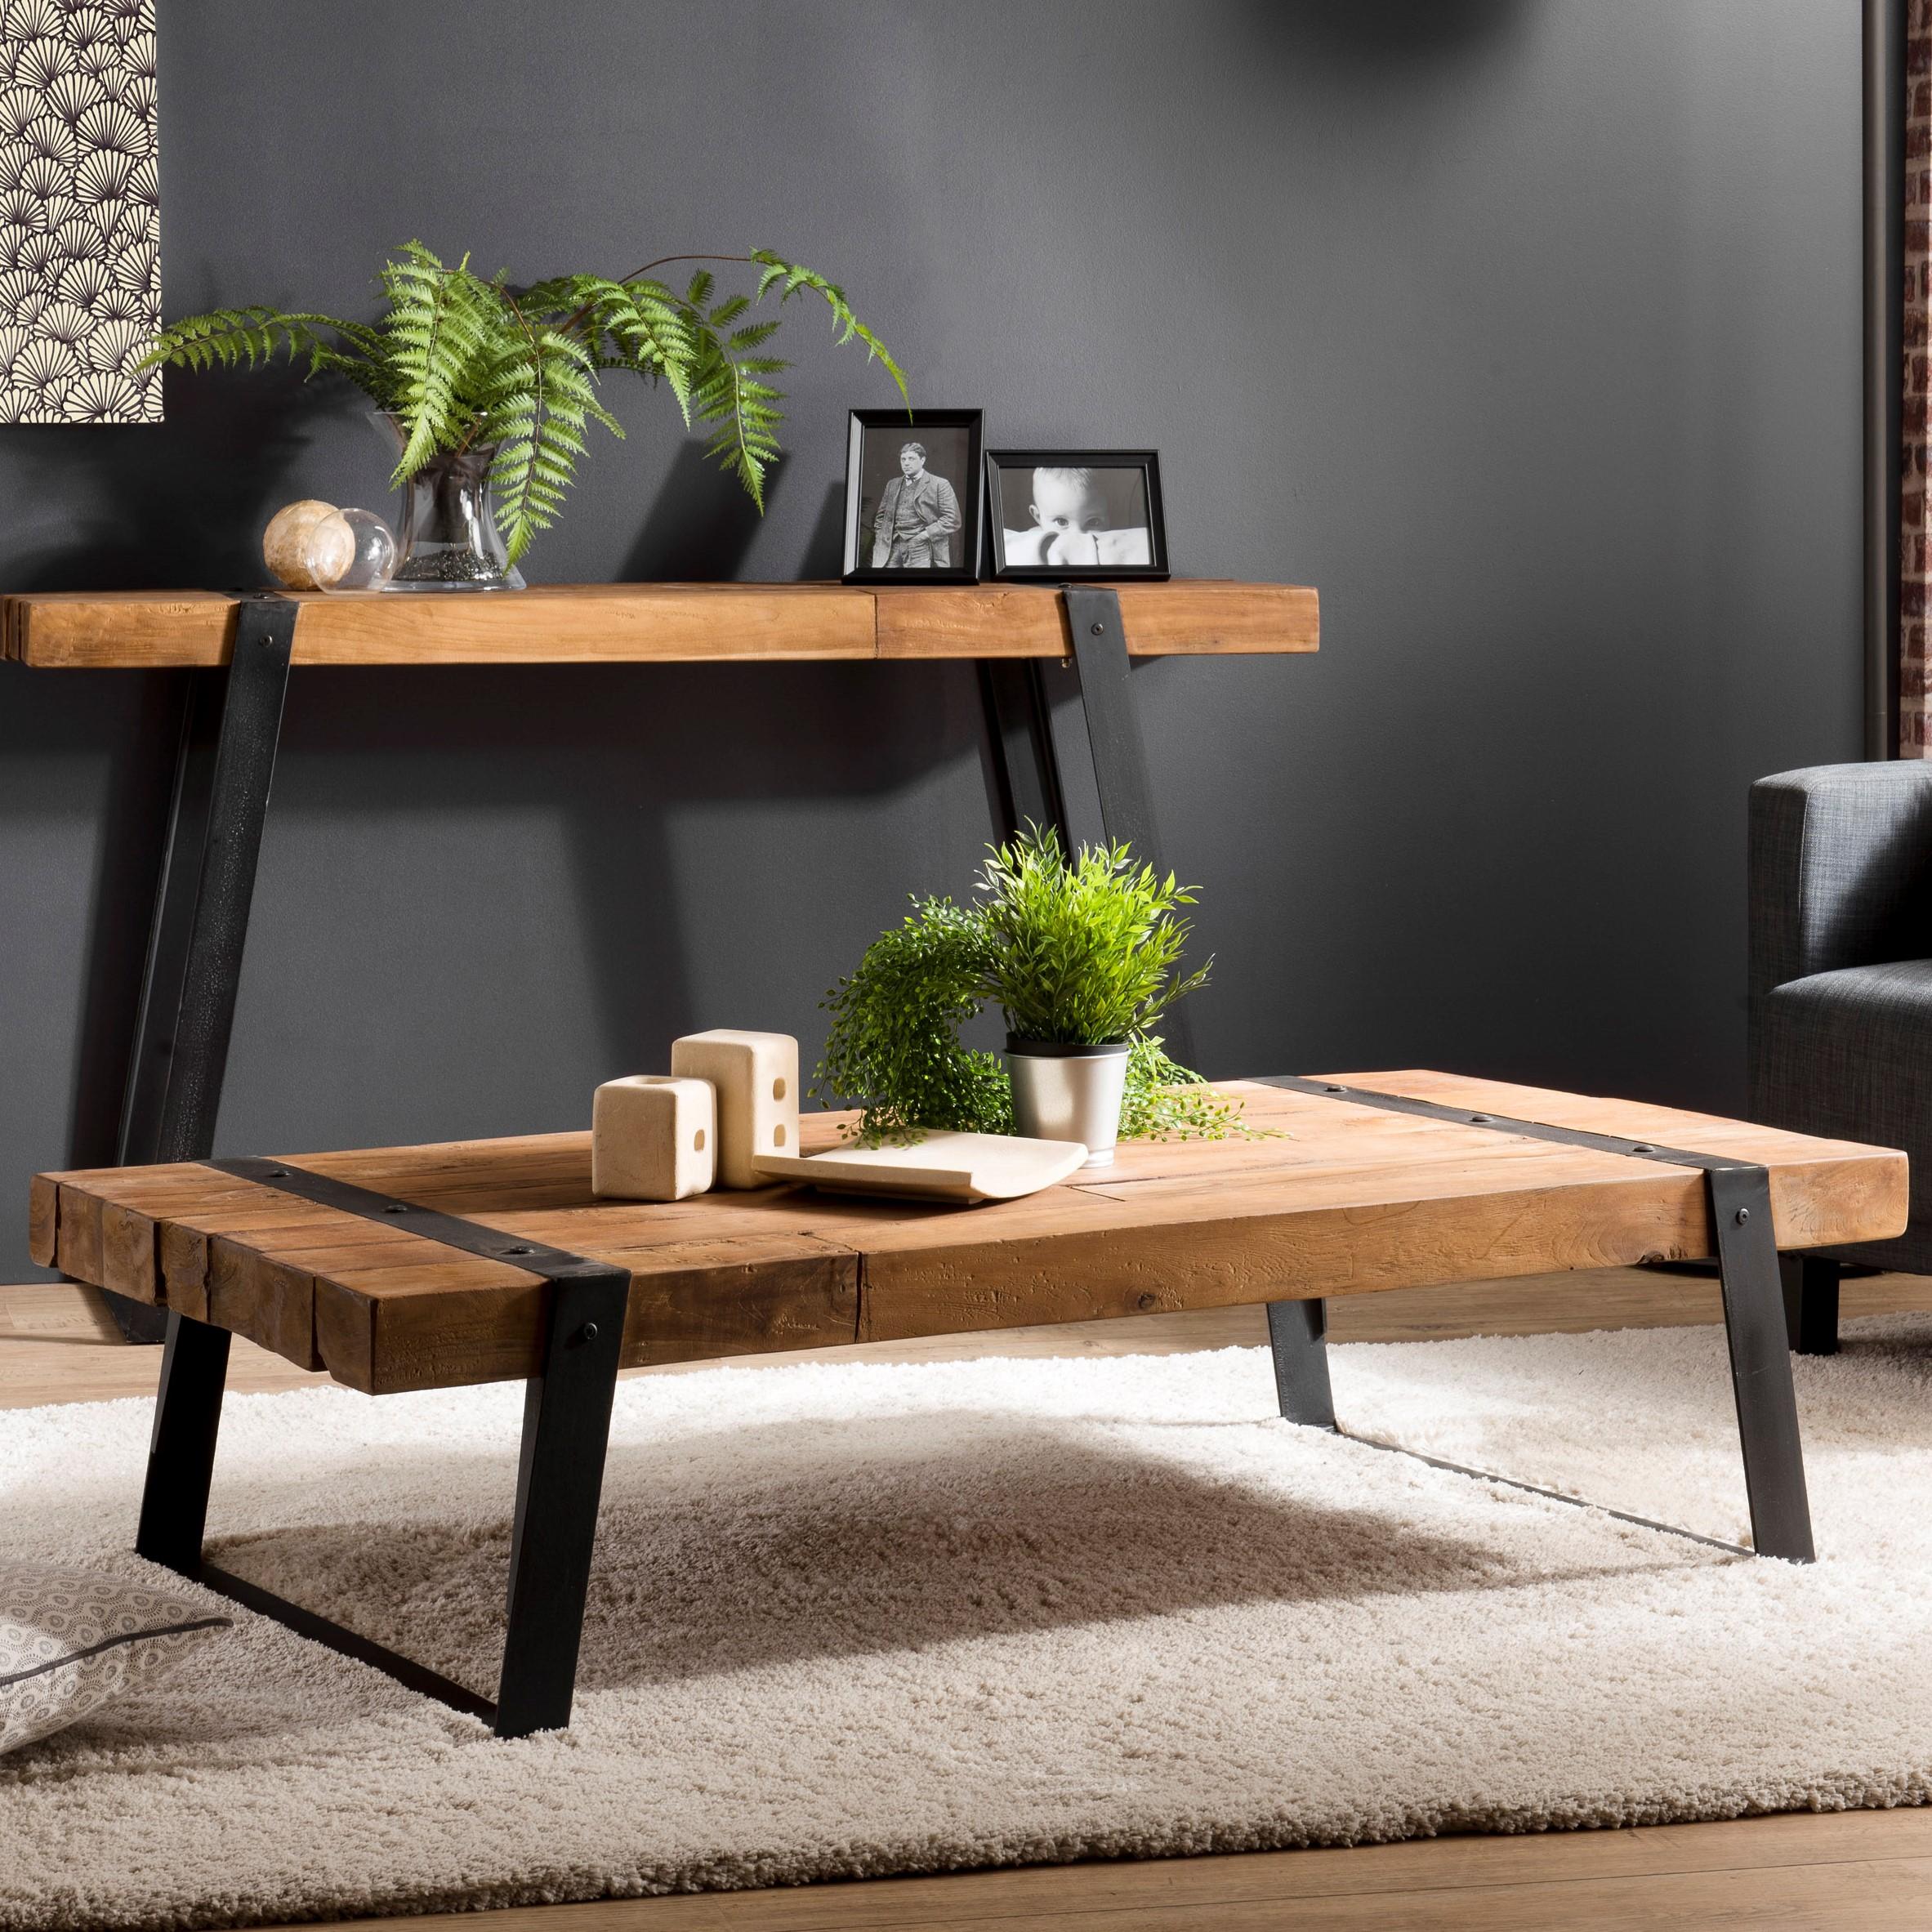 table basse industrielle bois recycle swing